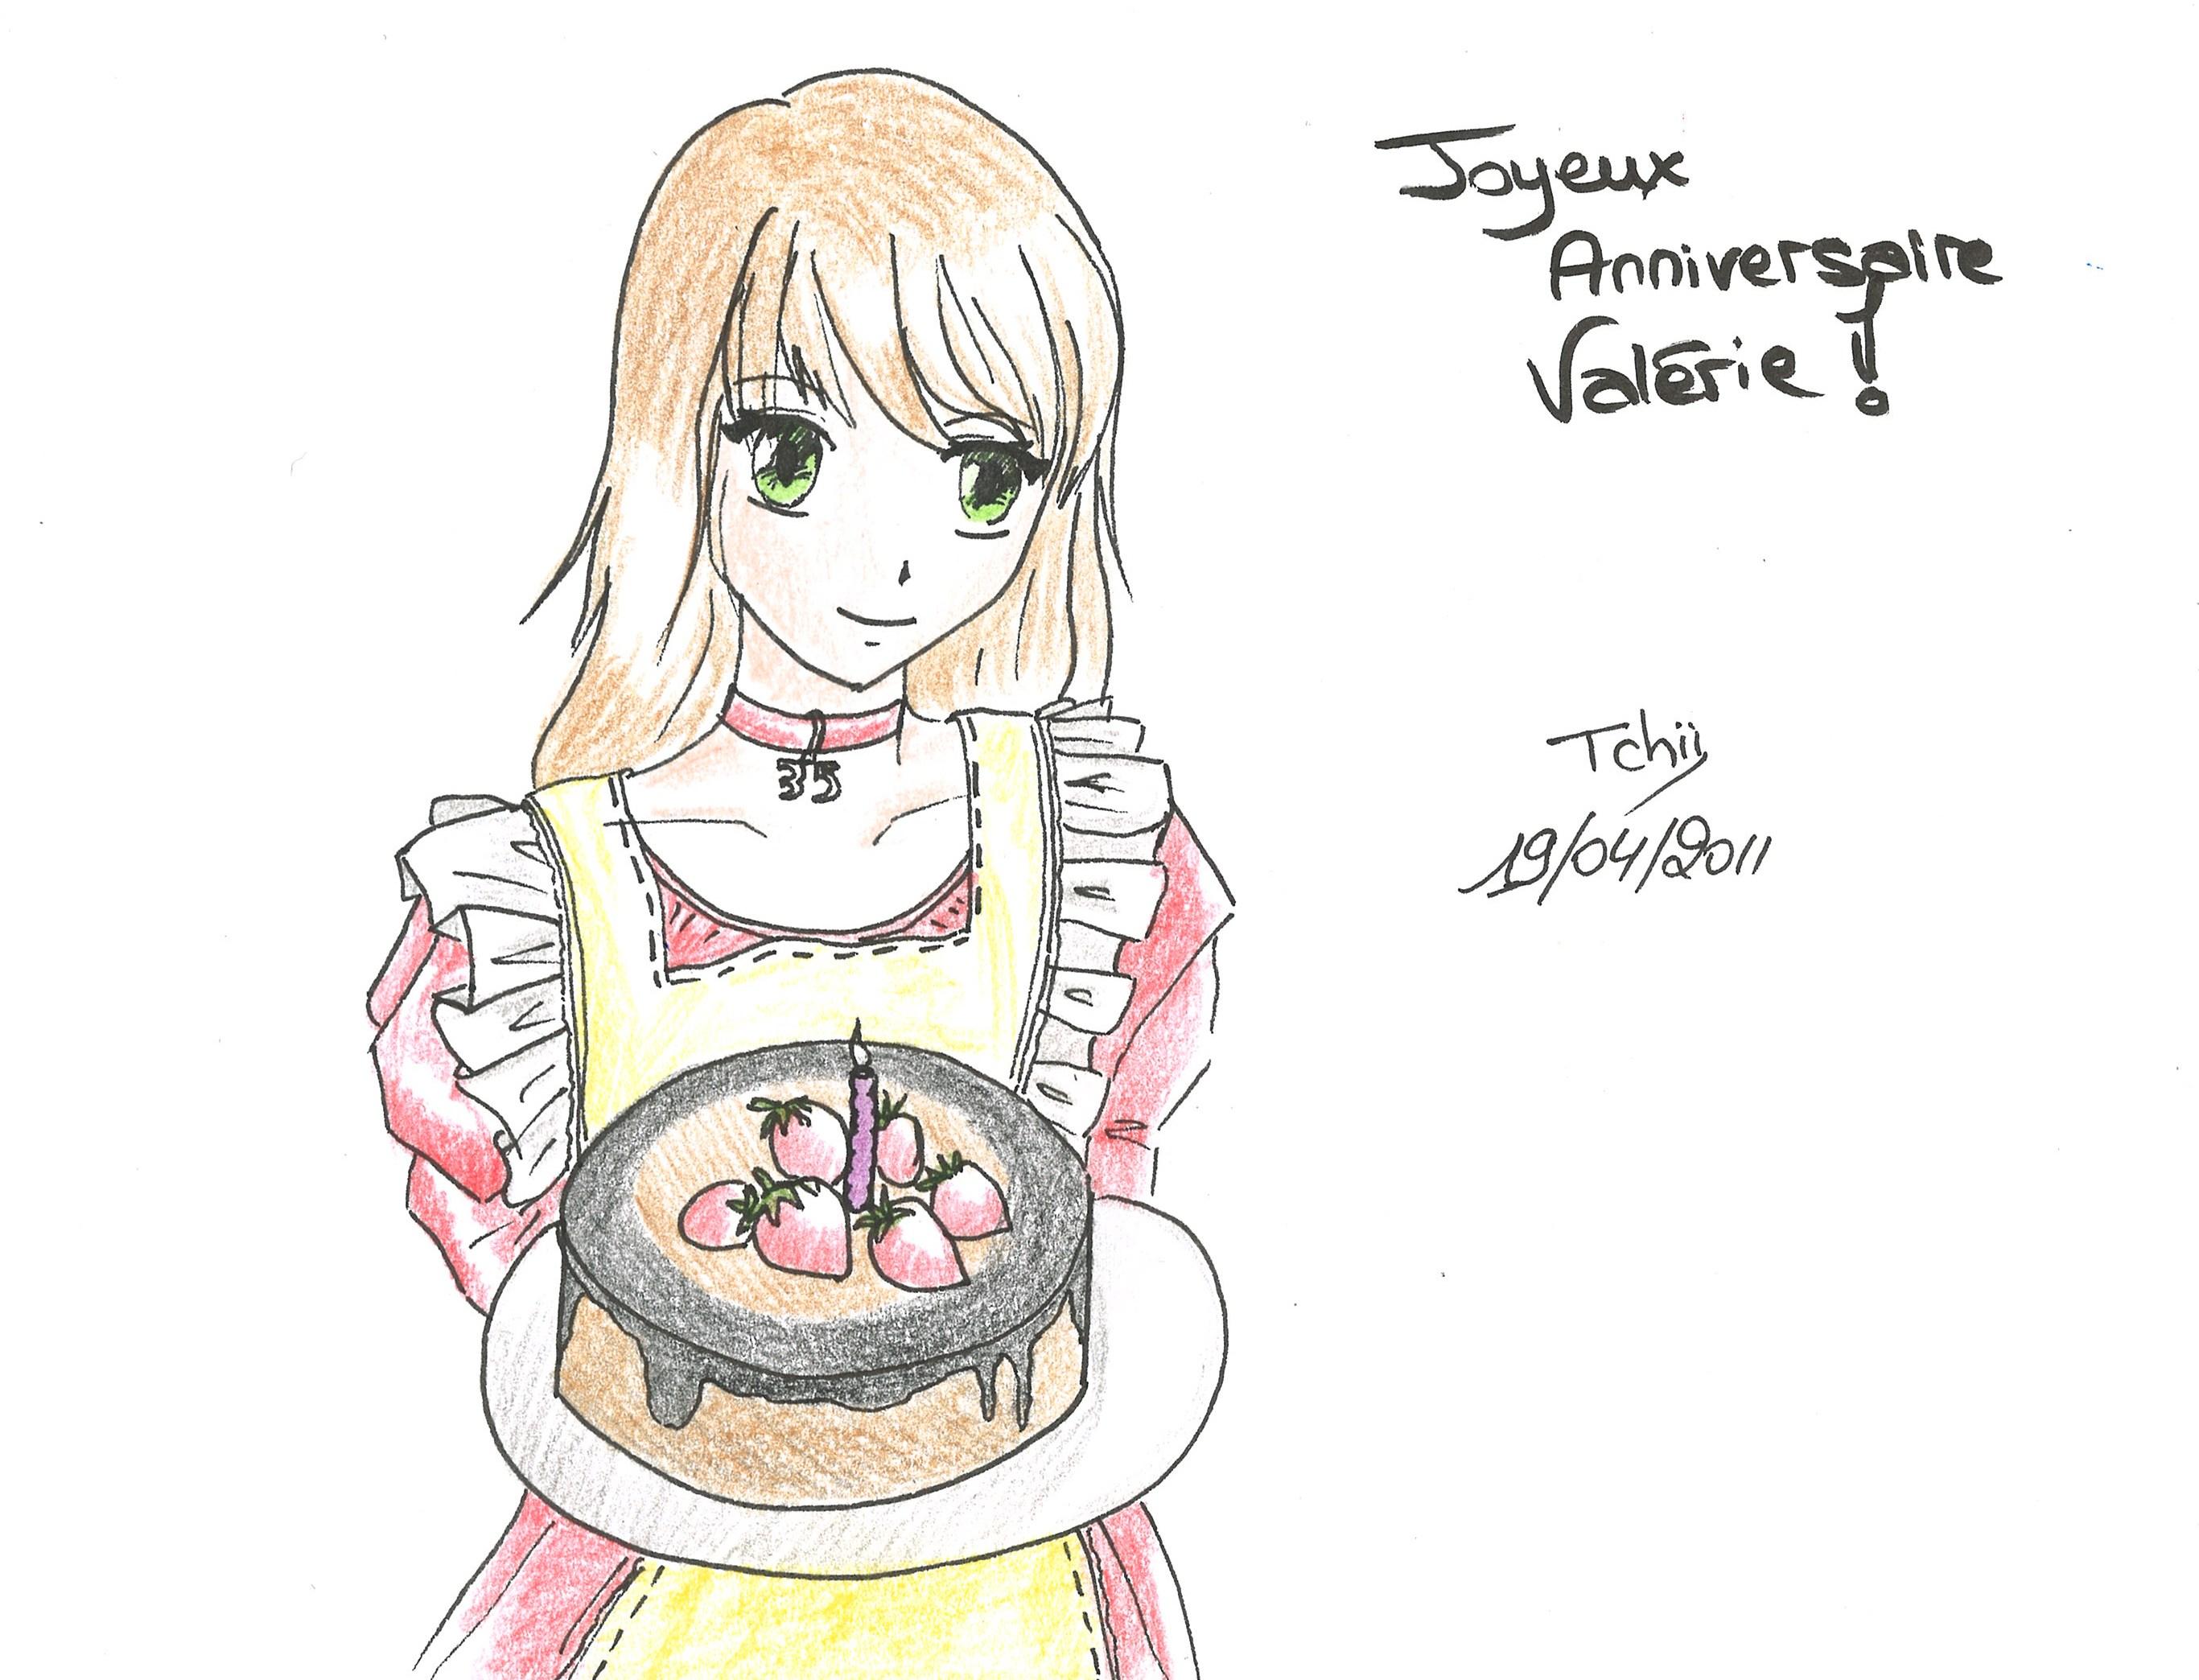 Dessin manga anniversaire - Dessin d anniversaire facile ...